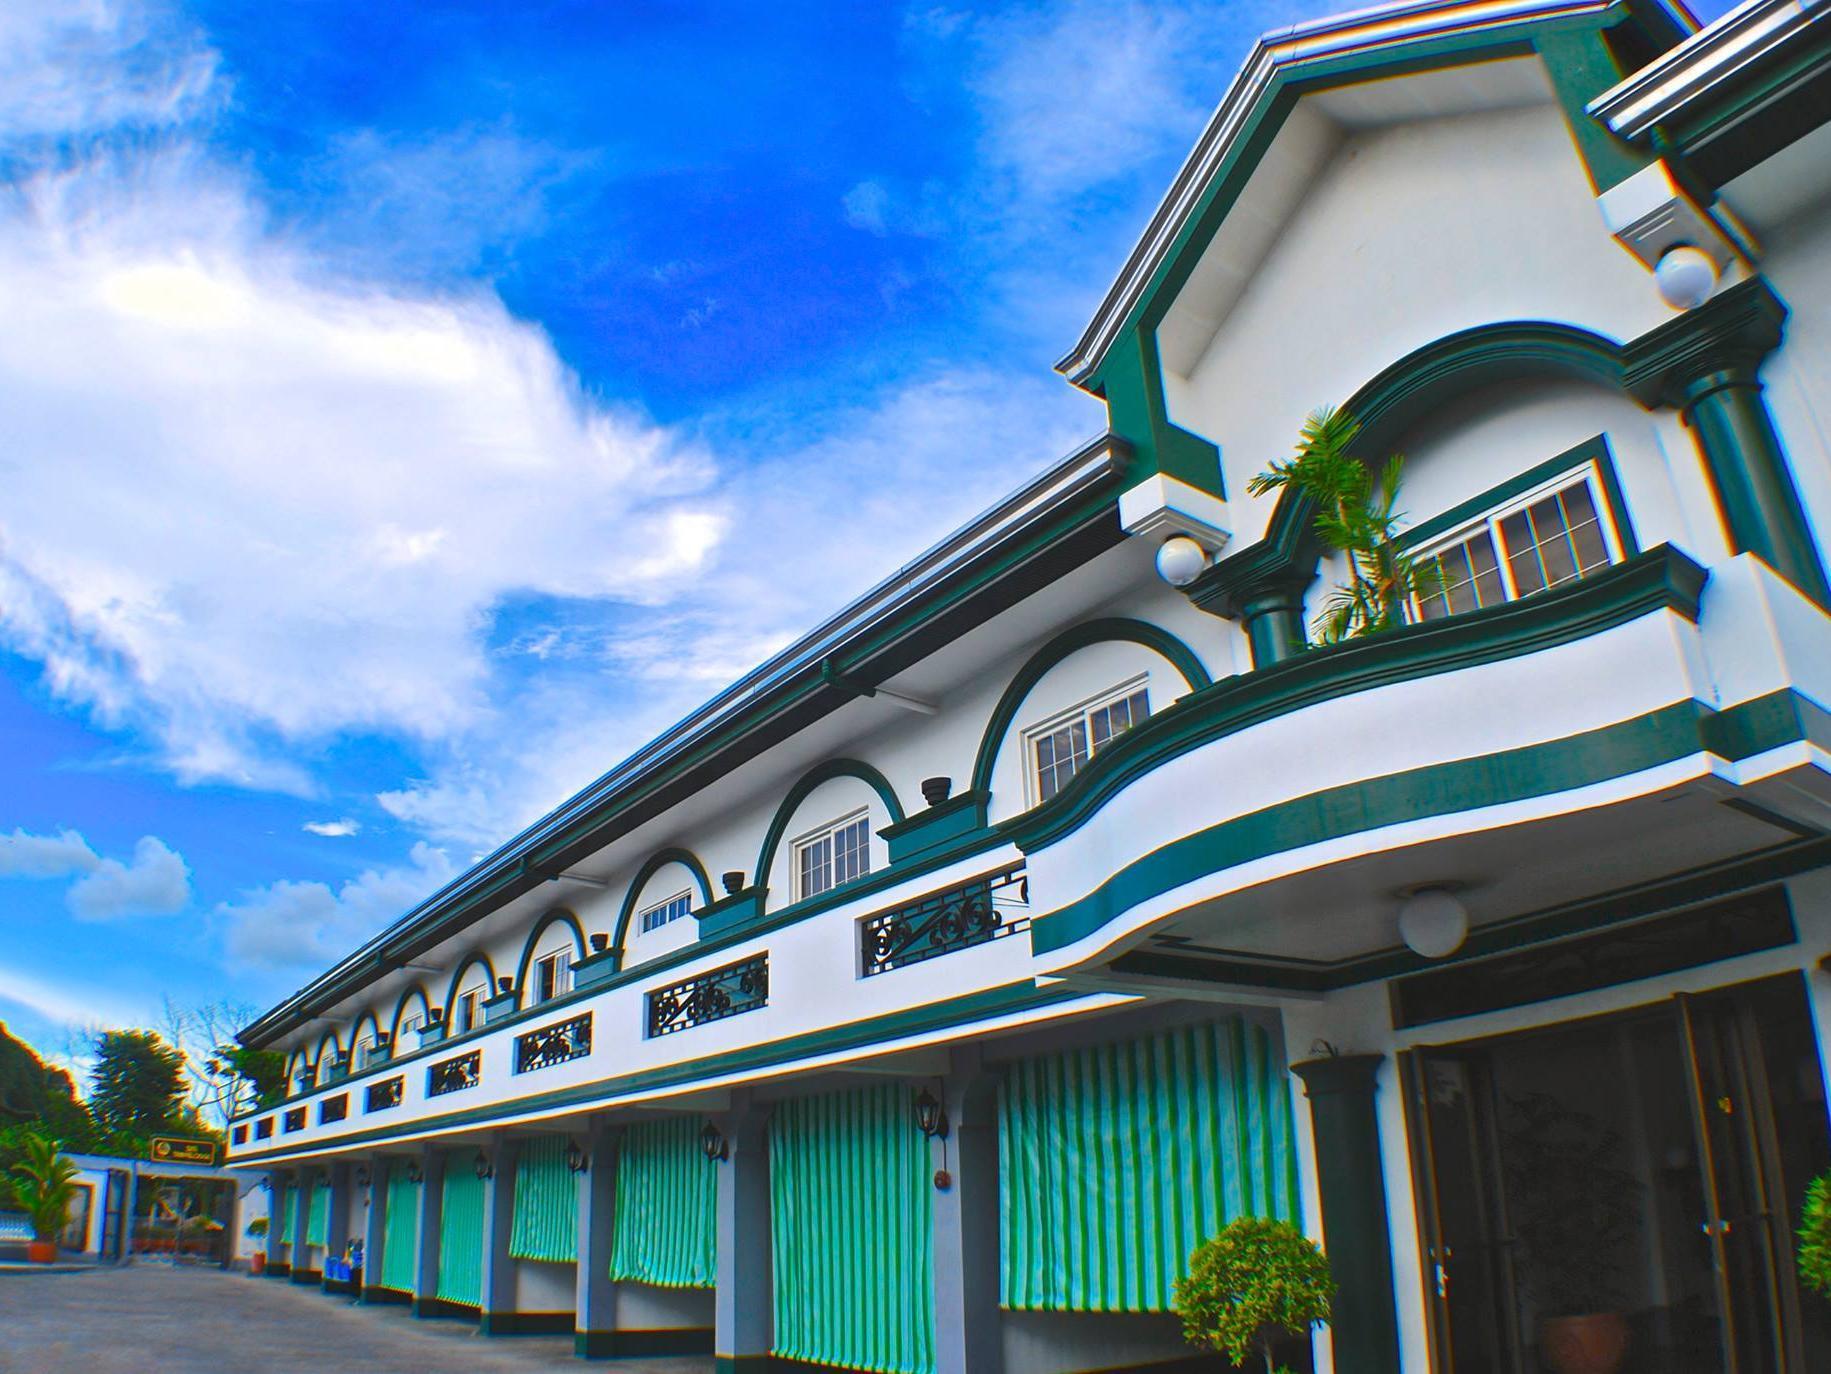 SM Travelodge Hotel & Restaurant